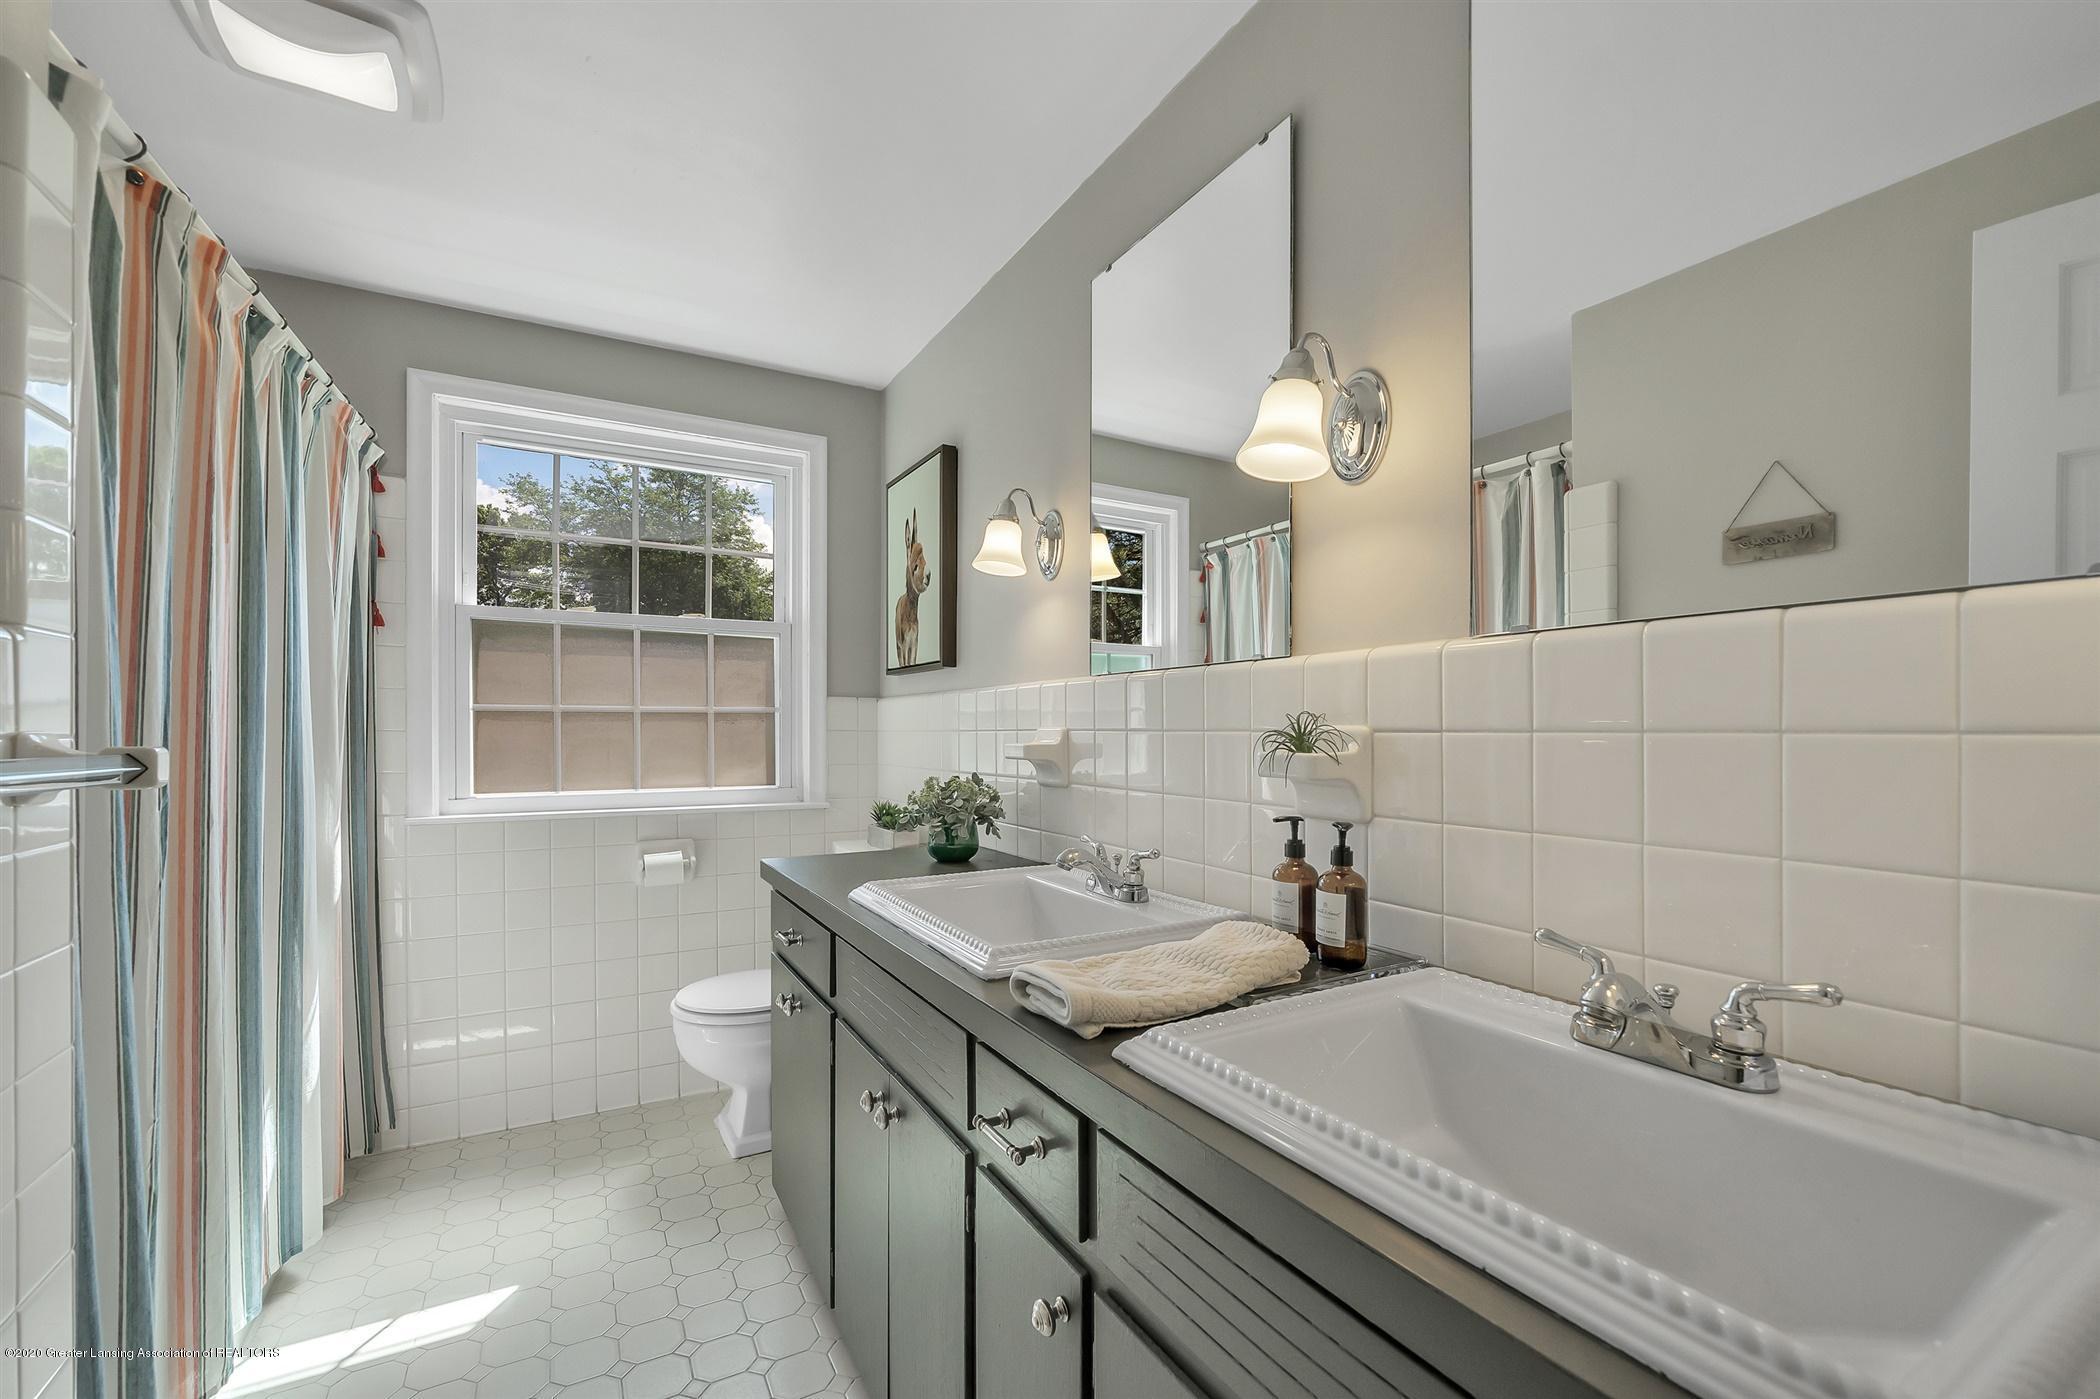 6069 Skyline Dr - (30) SECOND FLOOR Full Bathroom - 29